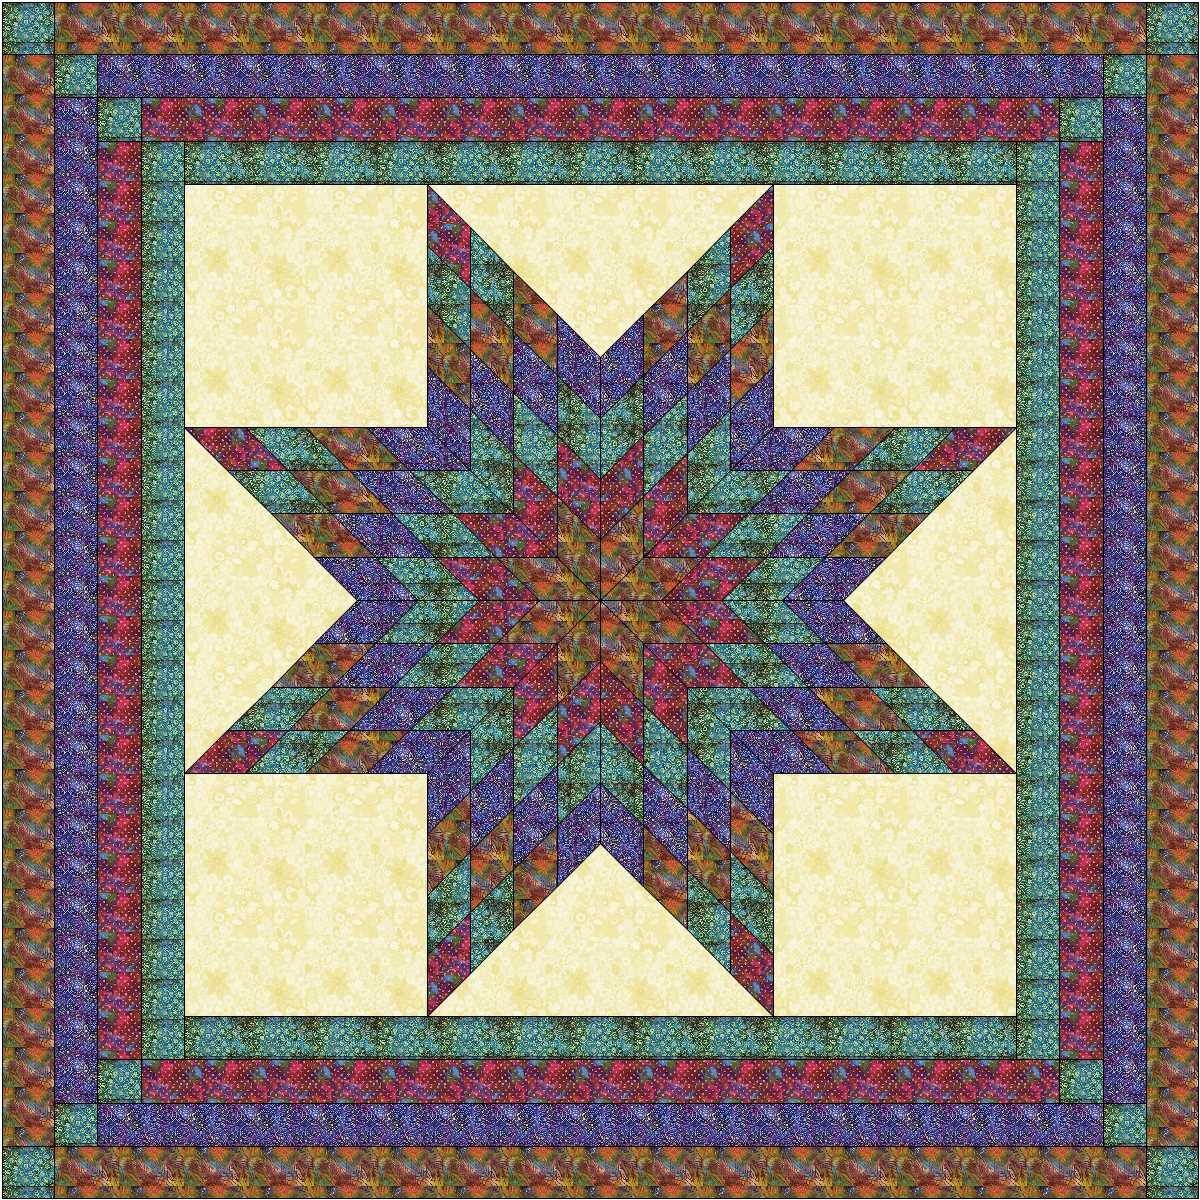 Easy Quilt Kit Brilliant Batik Lonestar-queen/EXPEDITED SHIPPING by Material Maven